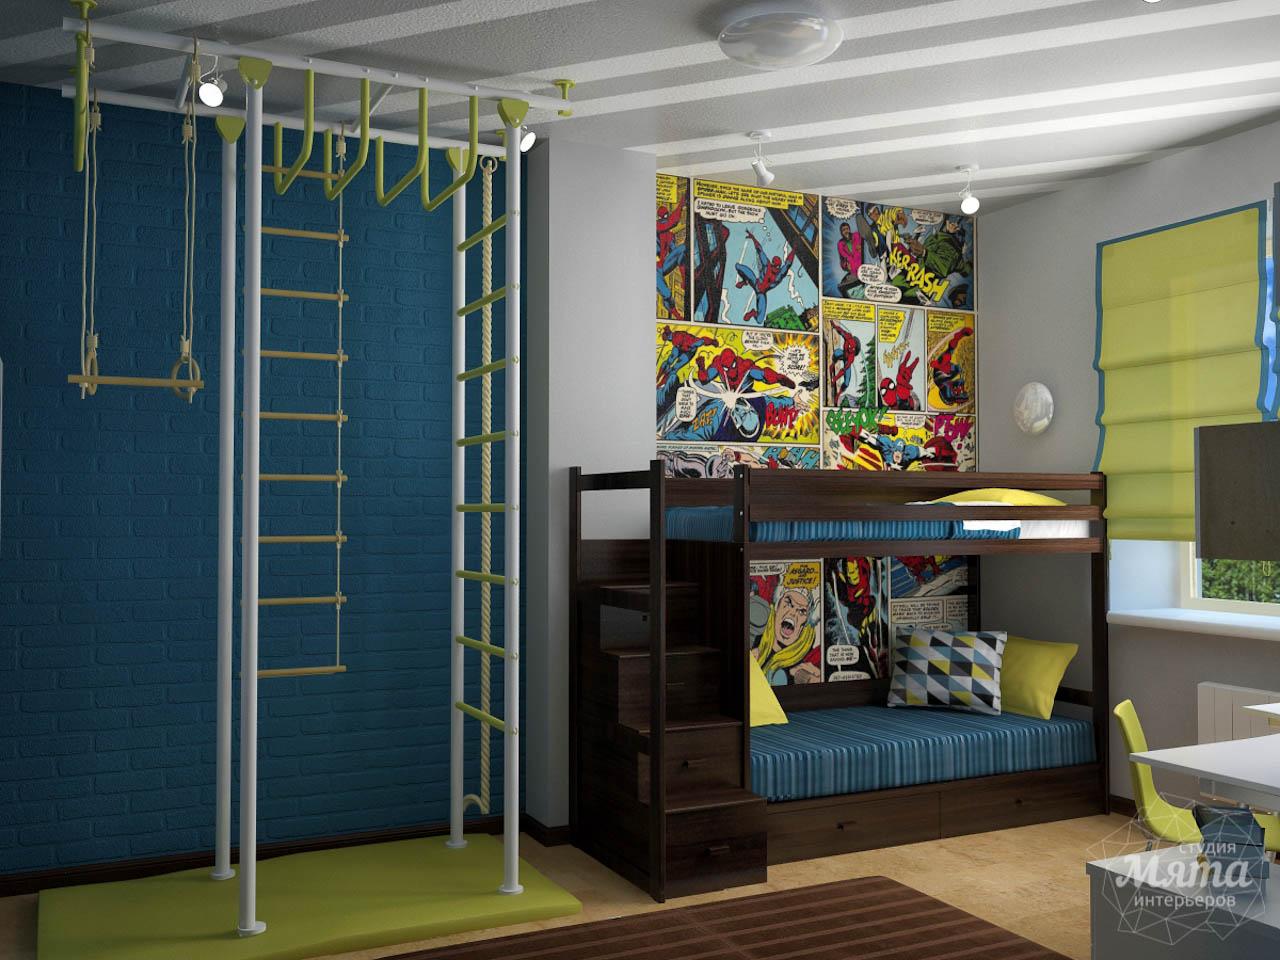 Дизайн проект интерьера коттеджа  в стиле минимализм по ул. Барвинка 15 img1363645181